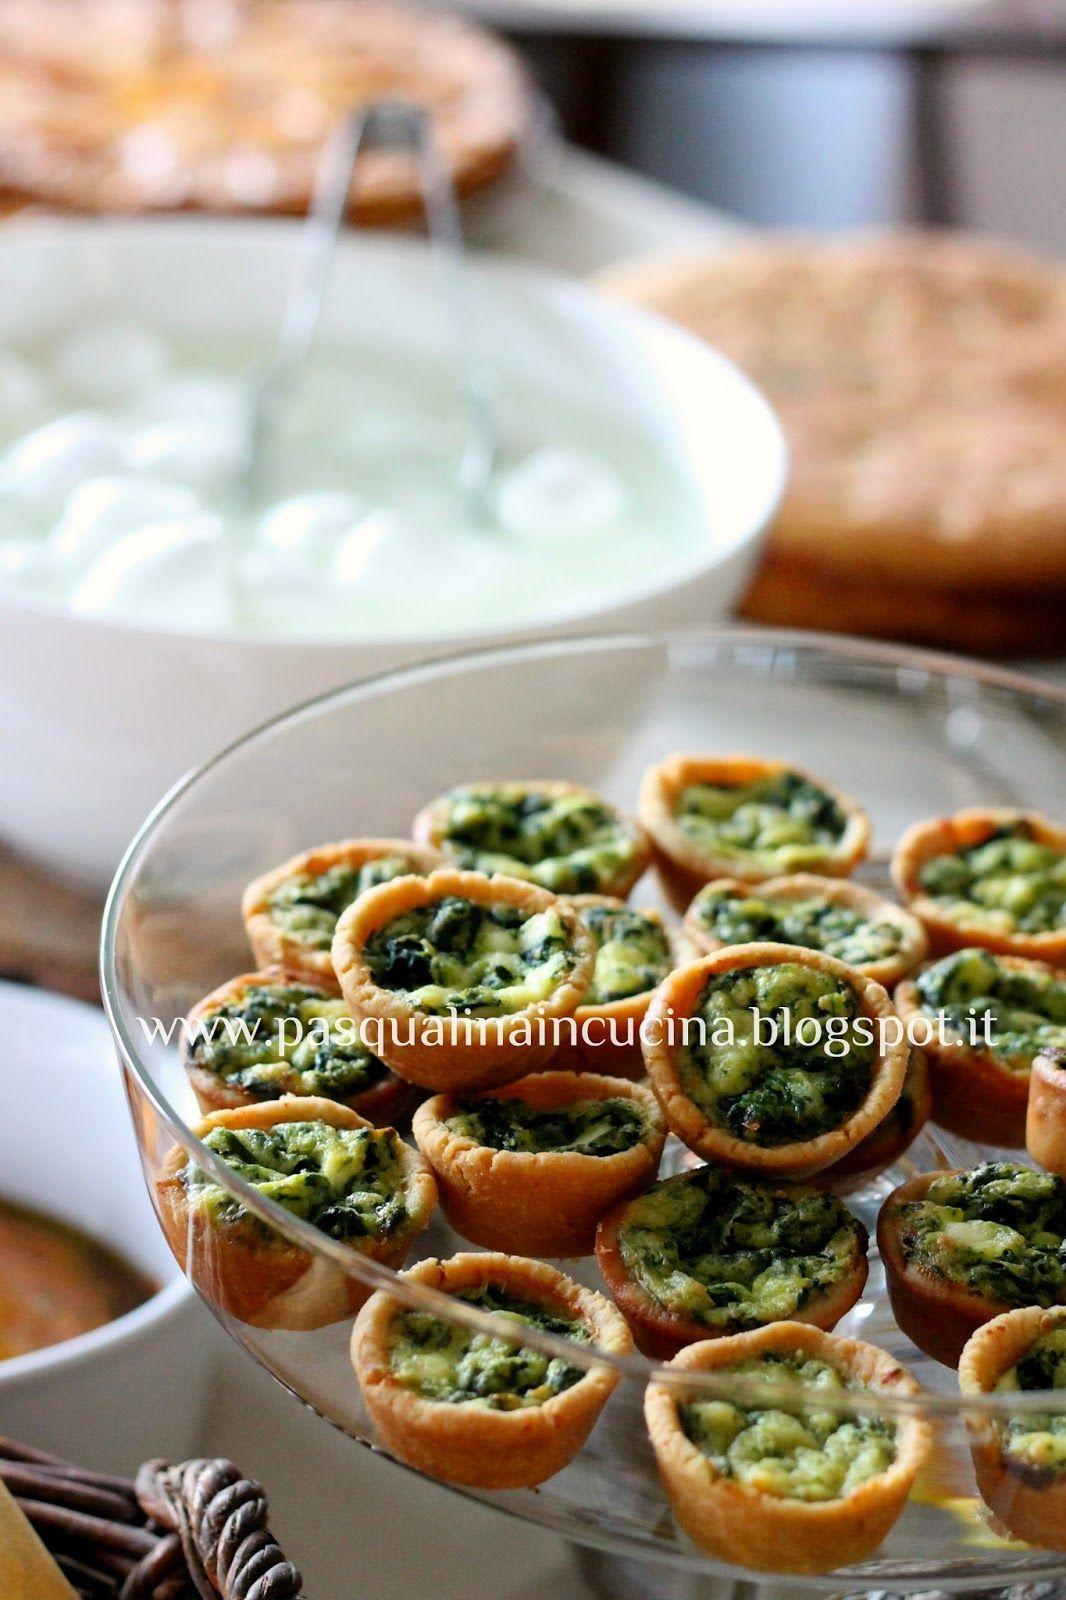 Pasqualina in cucina: Buffet d'Autunno